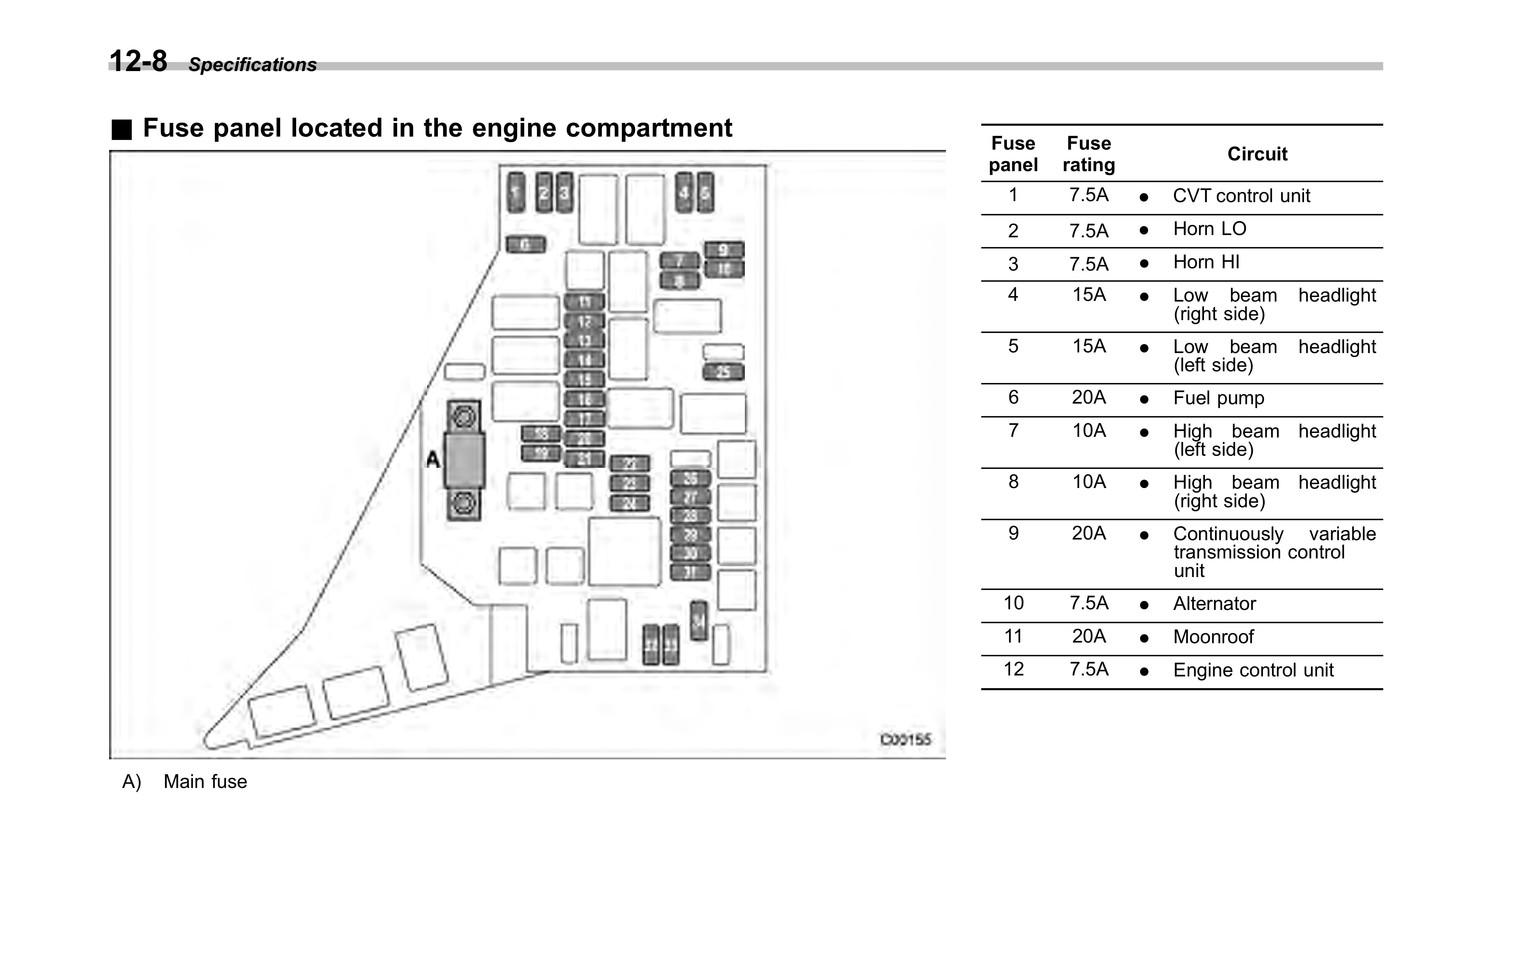 2013 subaru outback stereo wiring diagram tz 5599  2008 subaru outback fuse diagram  tz 5599  2008 subaru outback fuse diagram